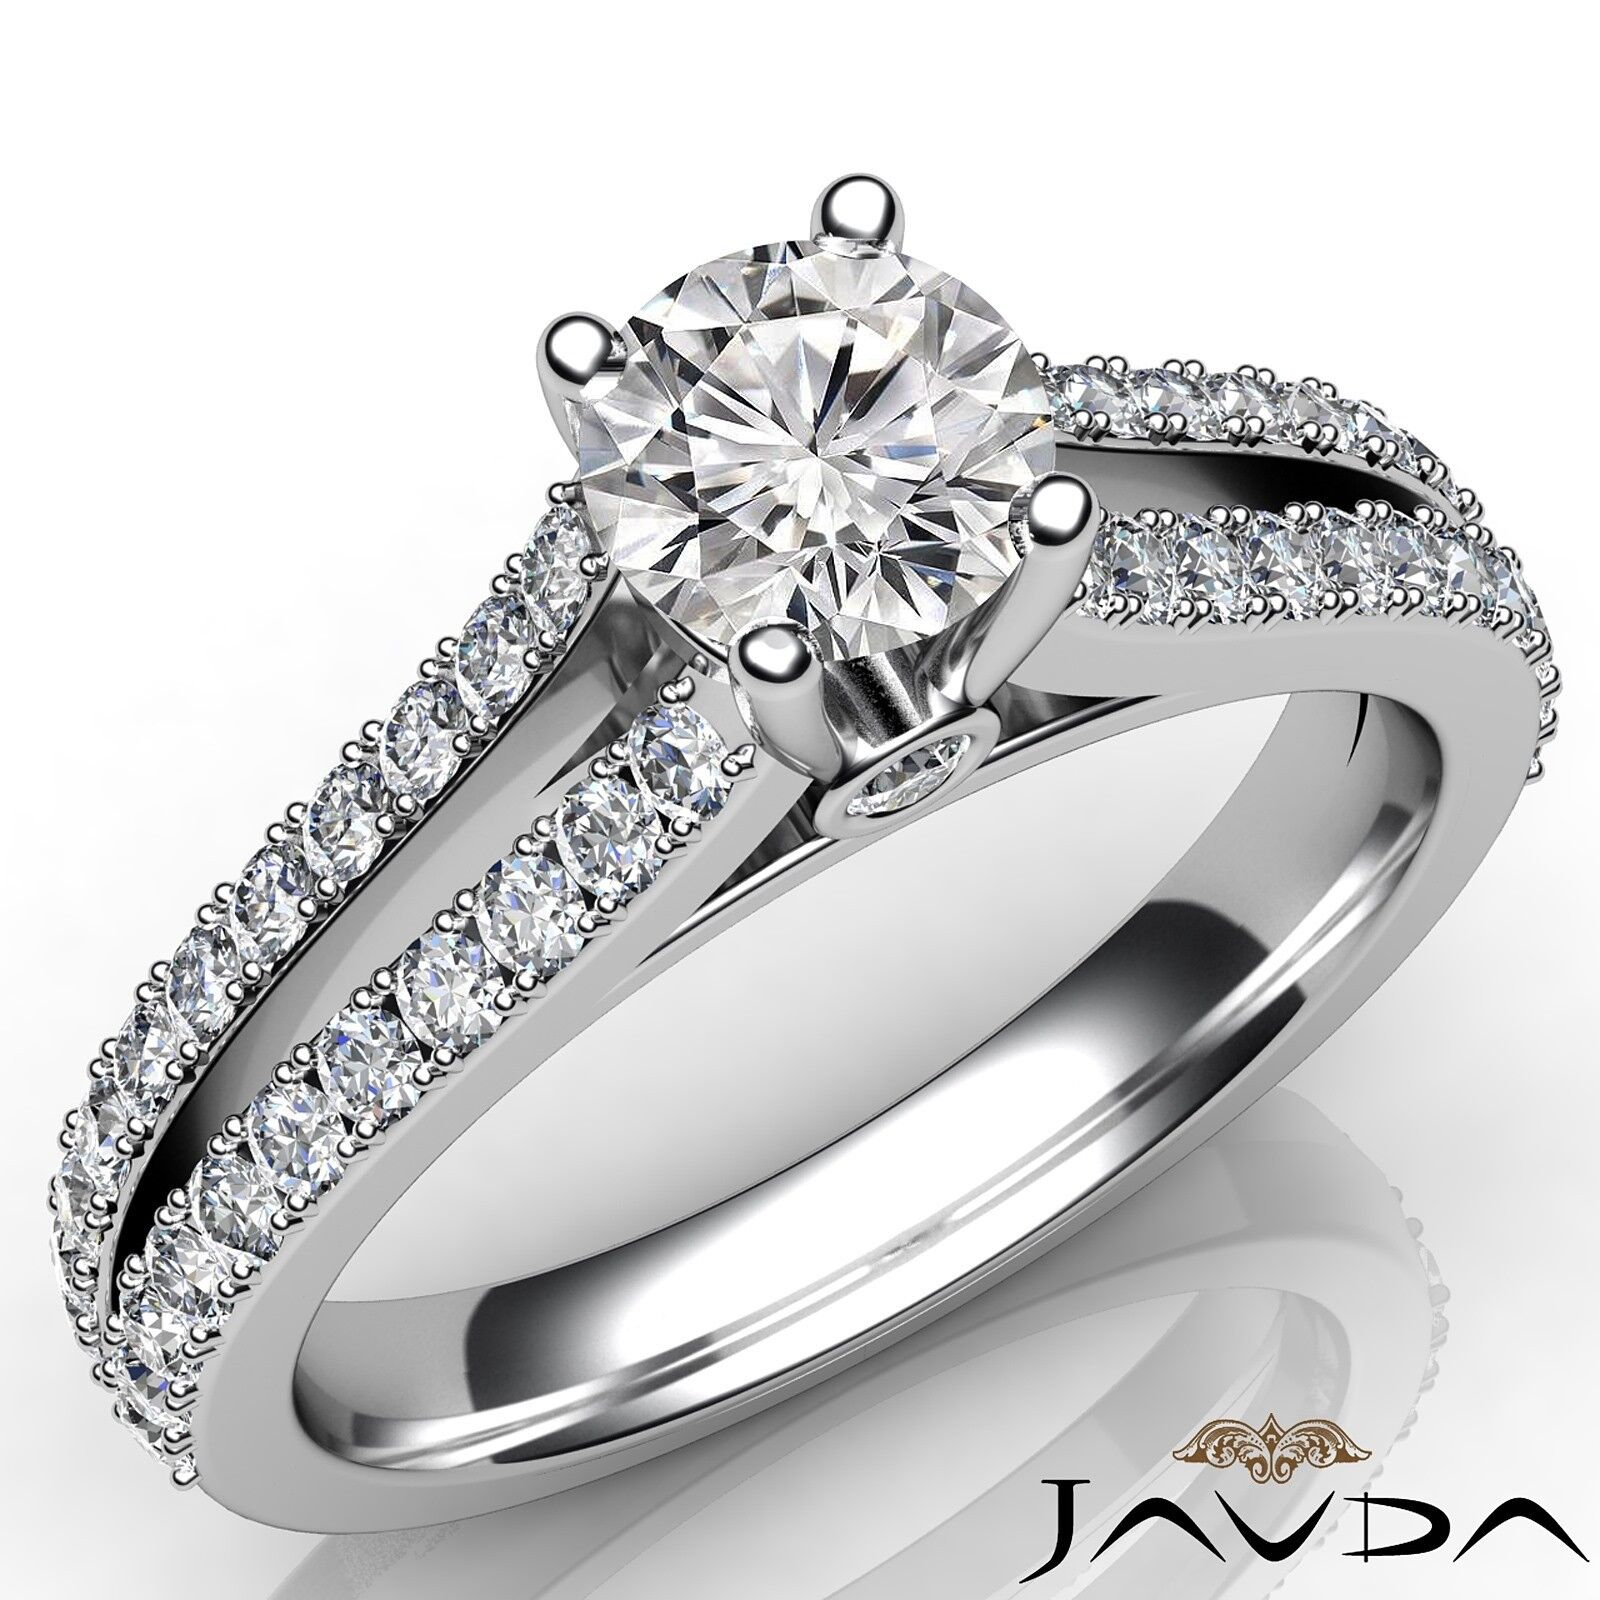 1.06ctw Natural 100% Round Diamond Engagement Ring GIA J-VS2 White Gold Women